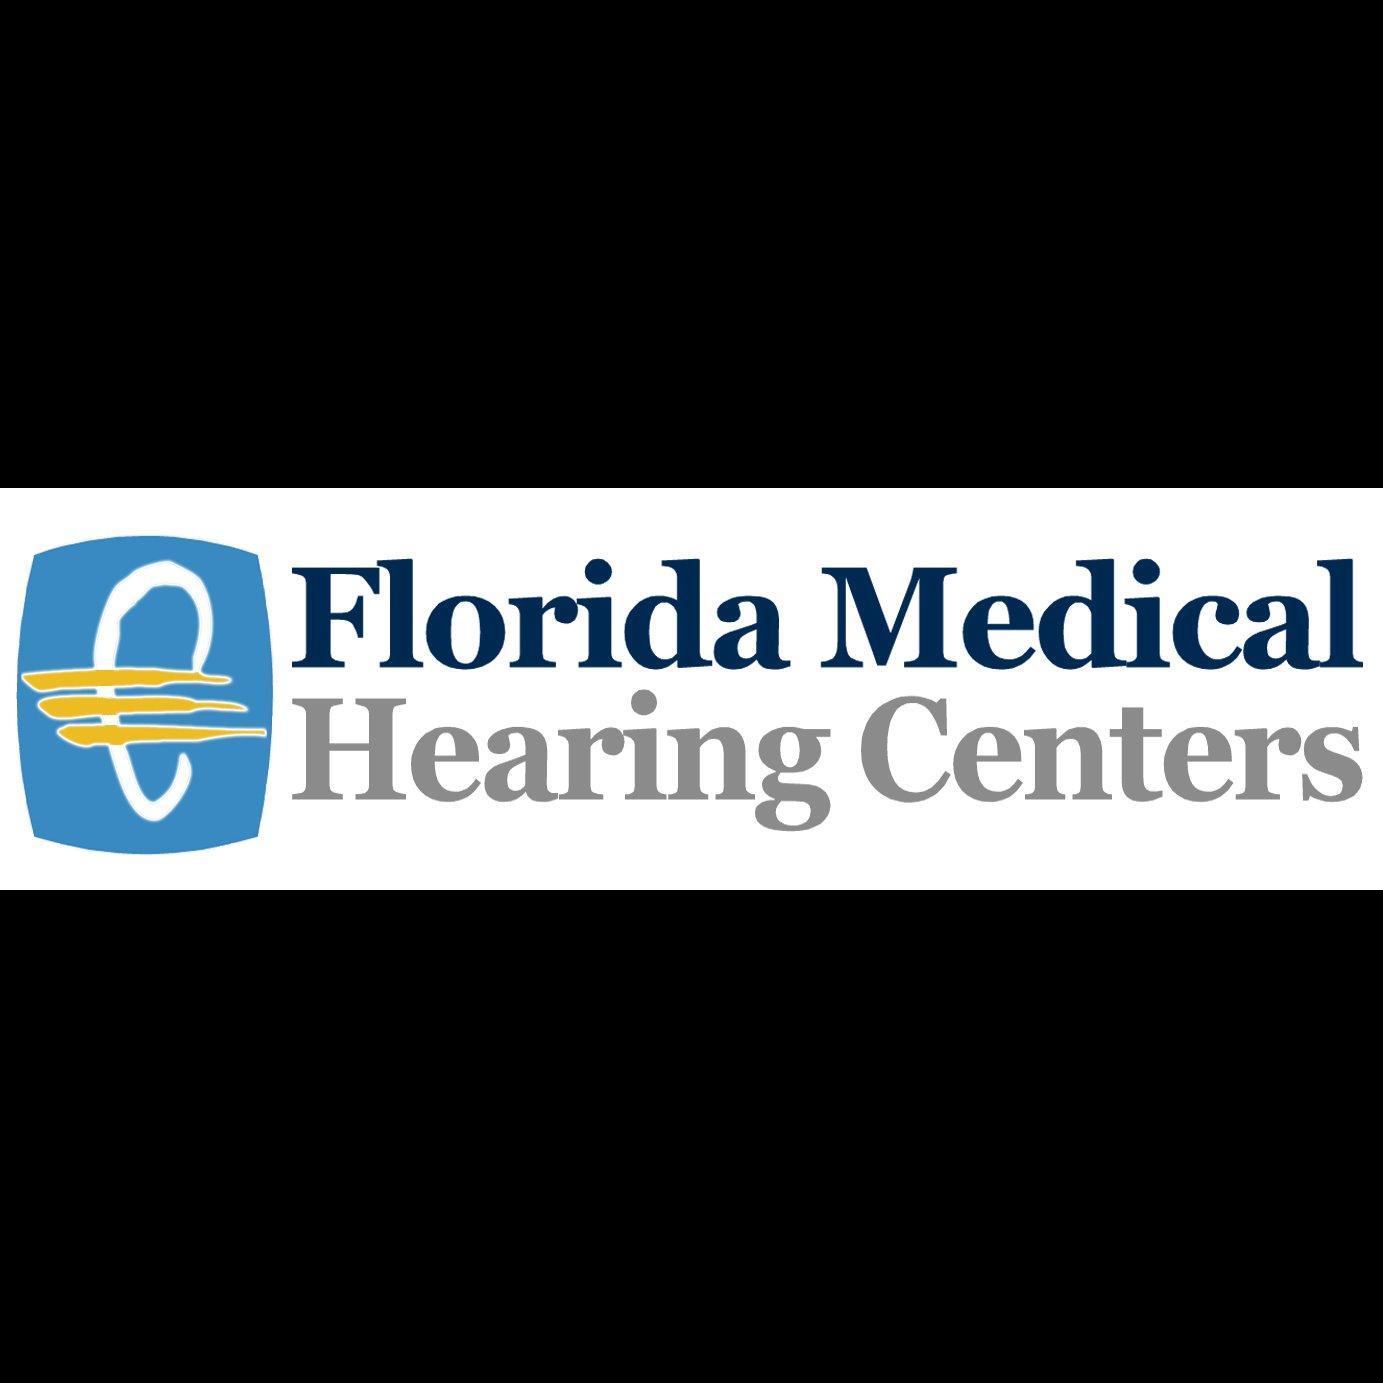 florida medical hearing centers in winter garden fl 407 745 4